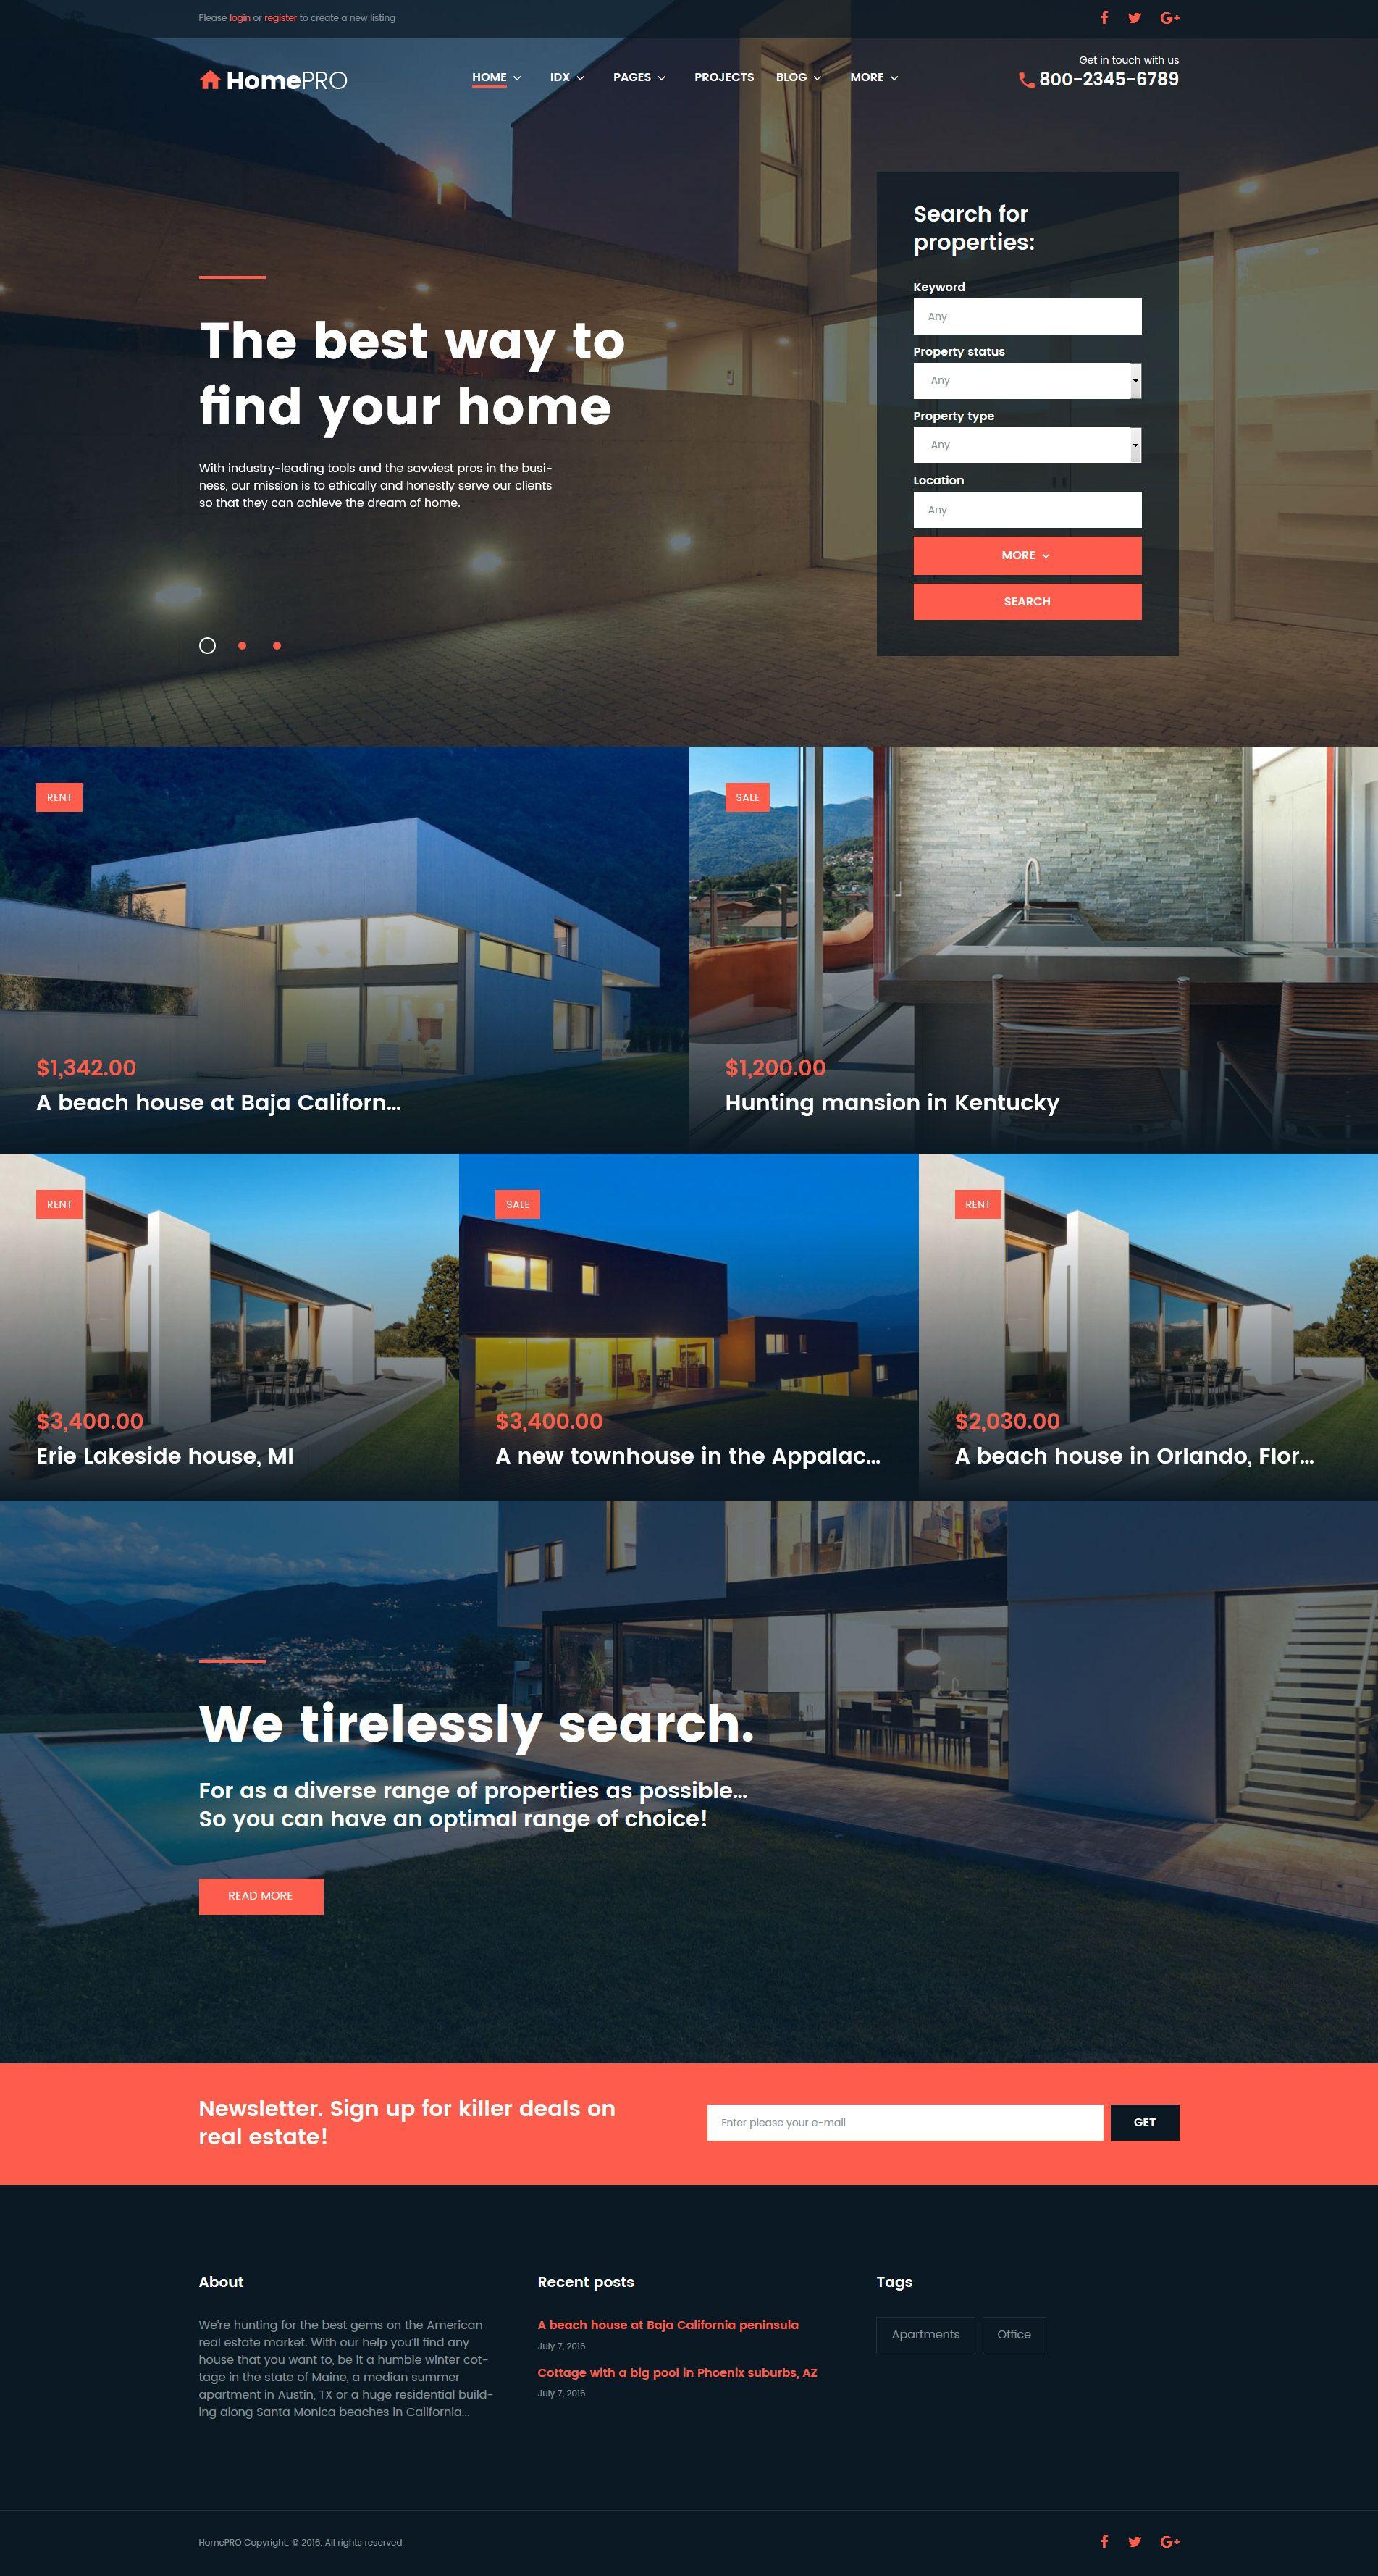 Homepro real estate portal wordpress theme new website templates homepro real estate portal wordpress theme httptemplatemonster wordpress themeshomepro real estate portal wordpress theme 61275ml maxwellsz